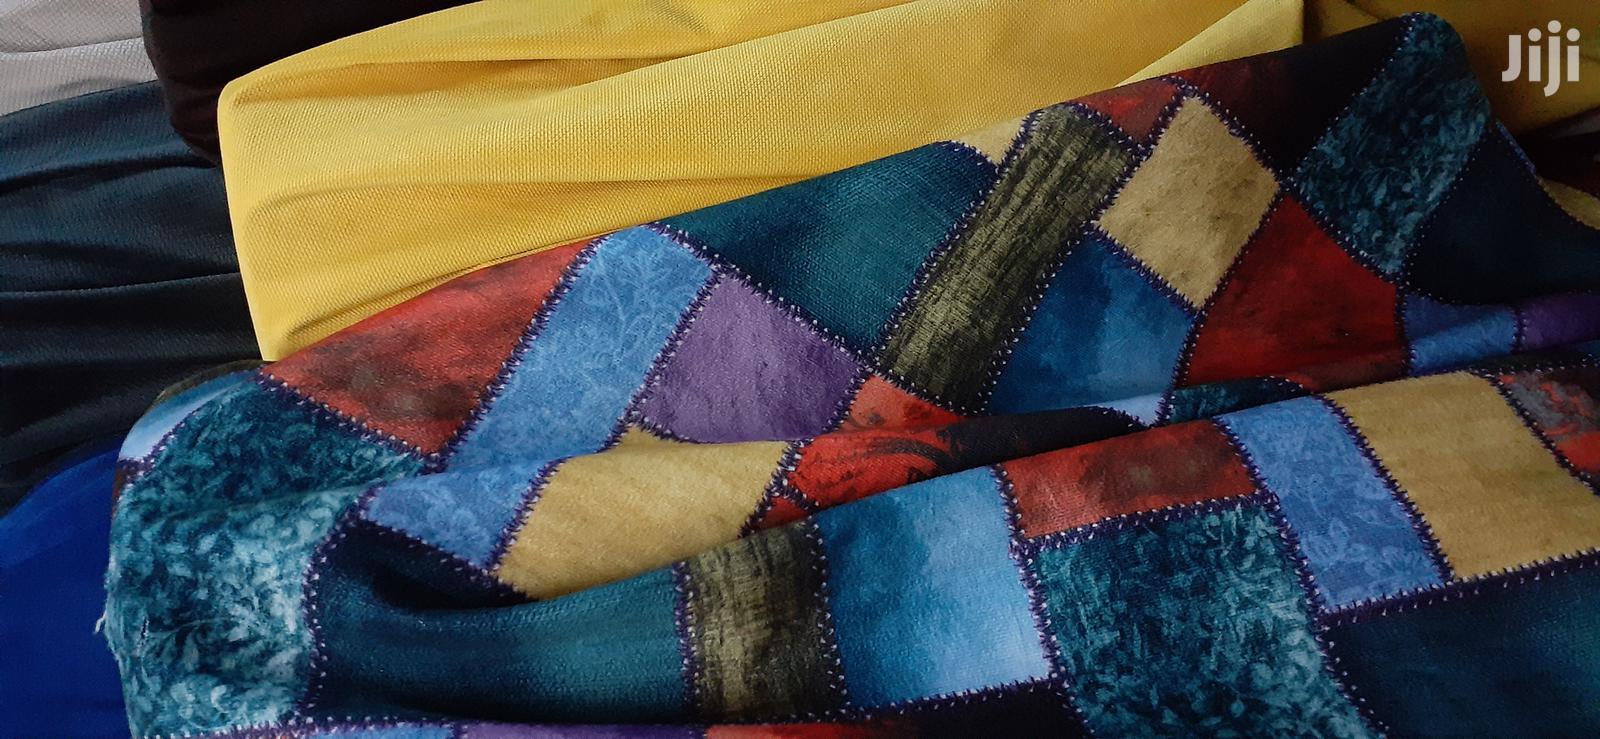 Cushions for Floor/Poufs | Home Accessories for sale in Ziwani/Kariokor, Nairobi, Kenya